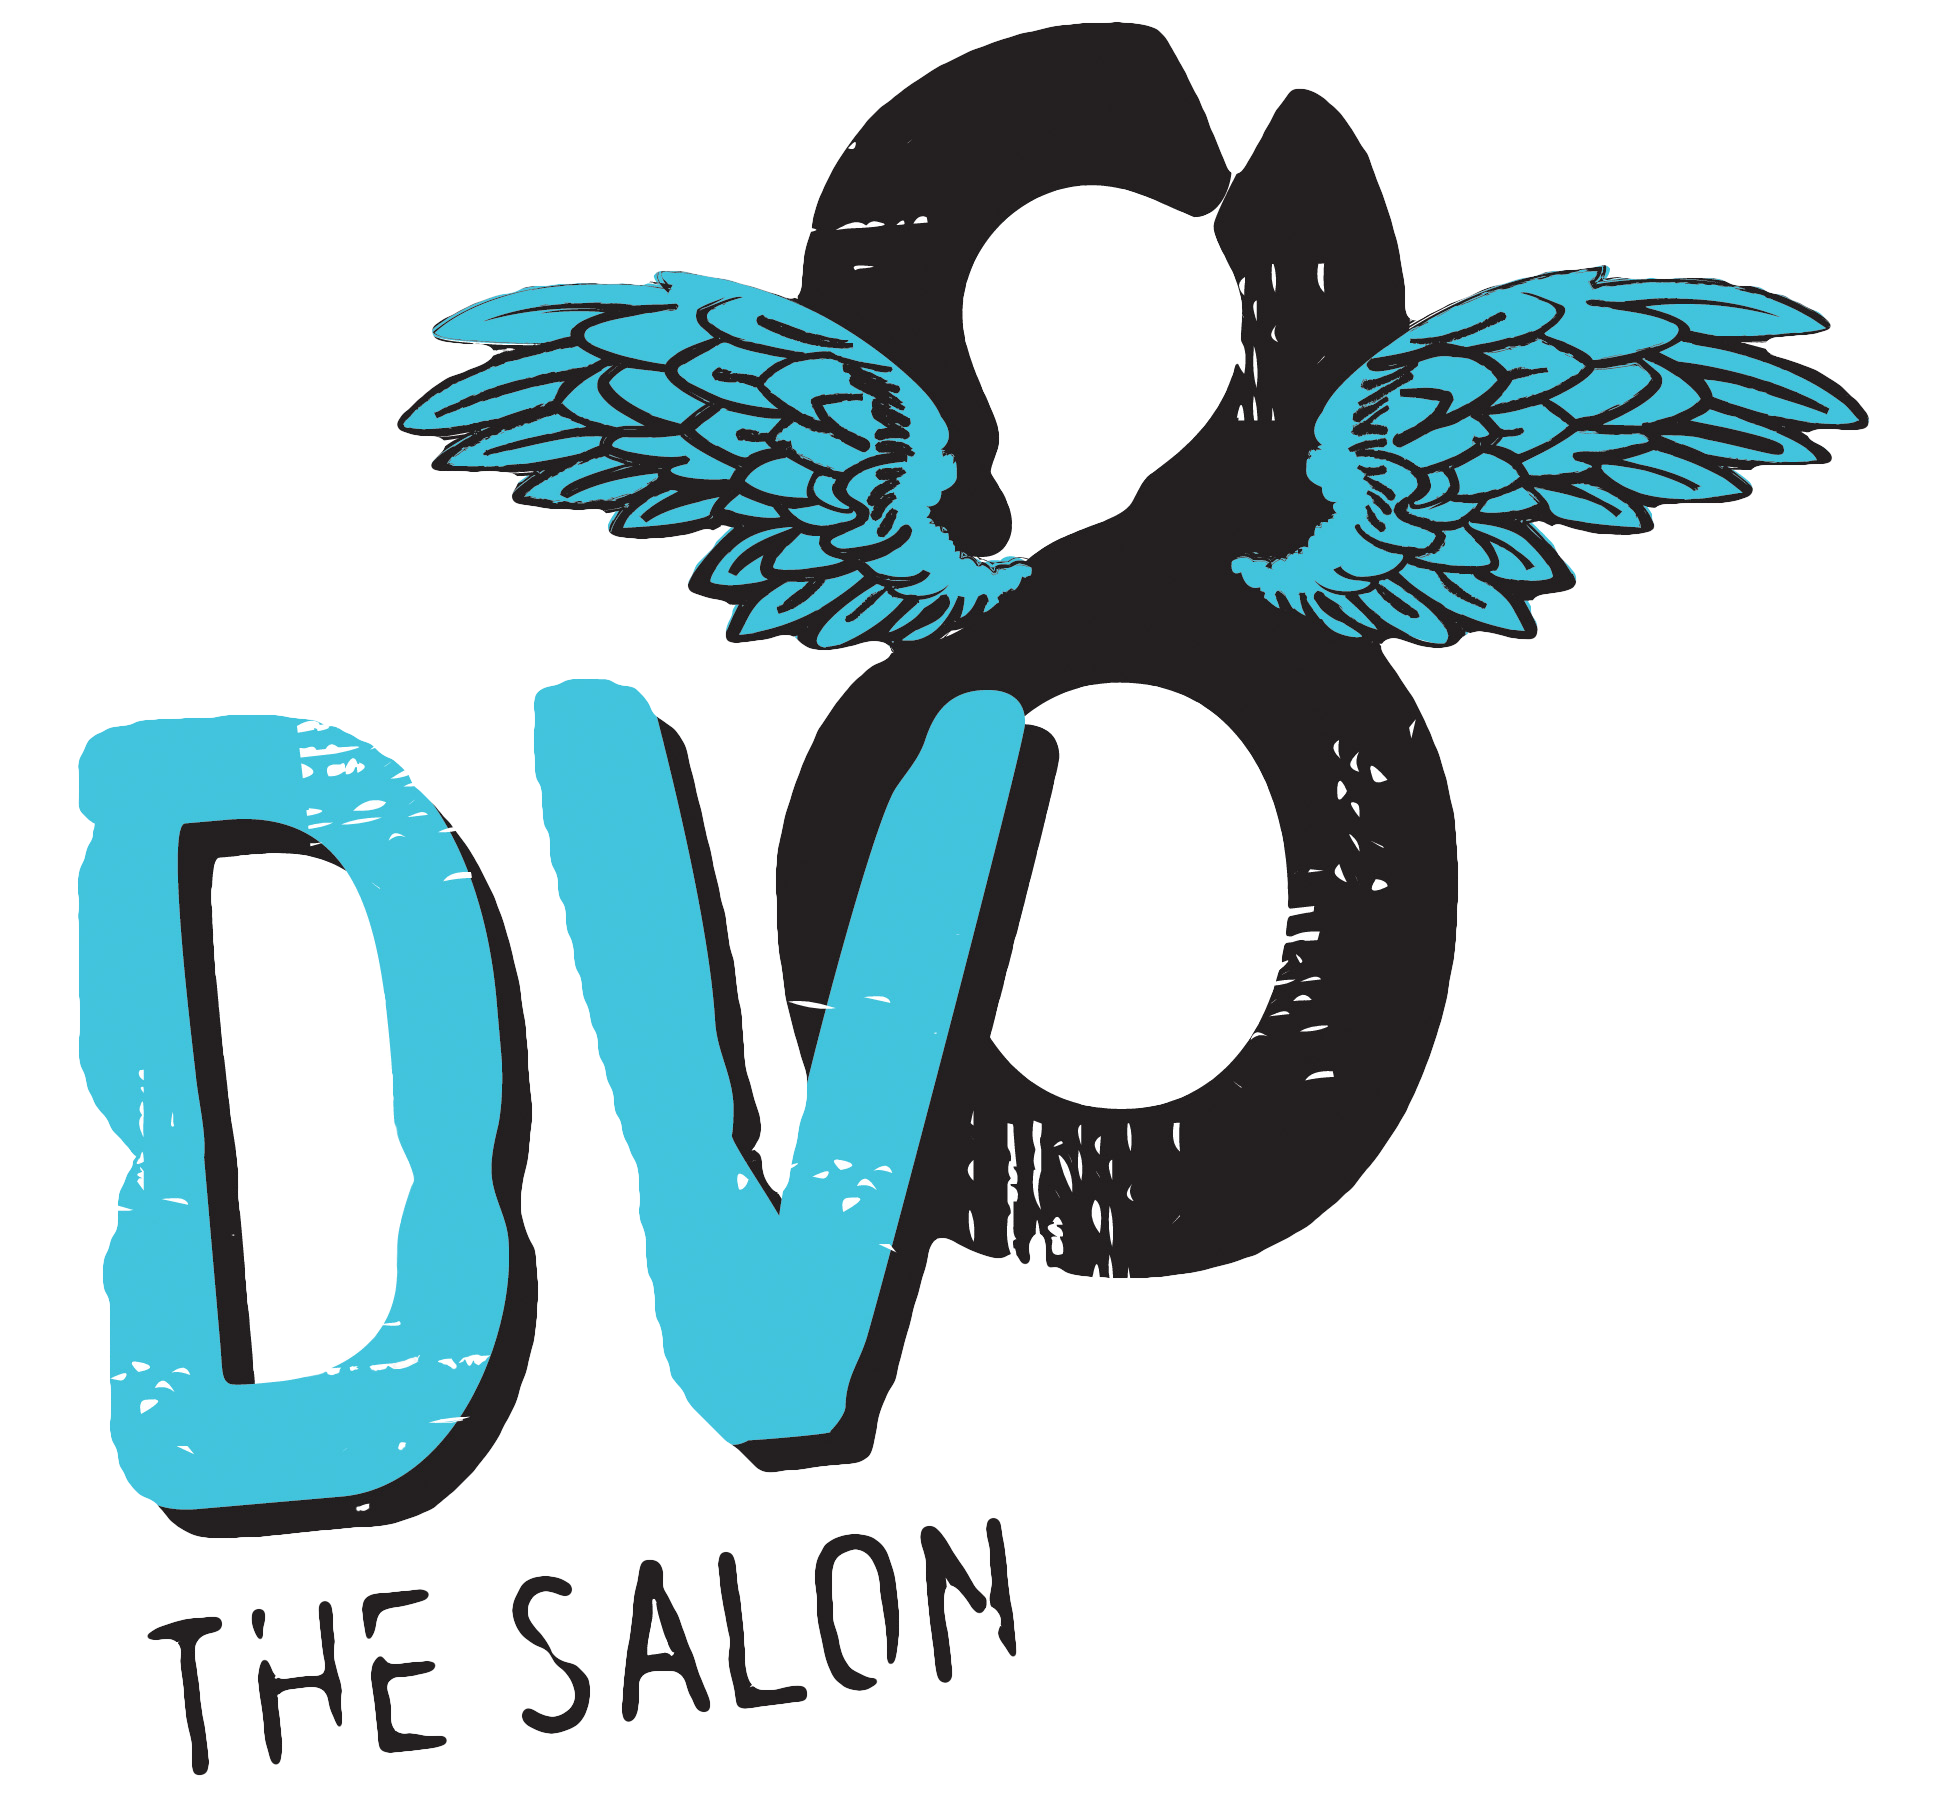 DV8 Salon